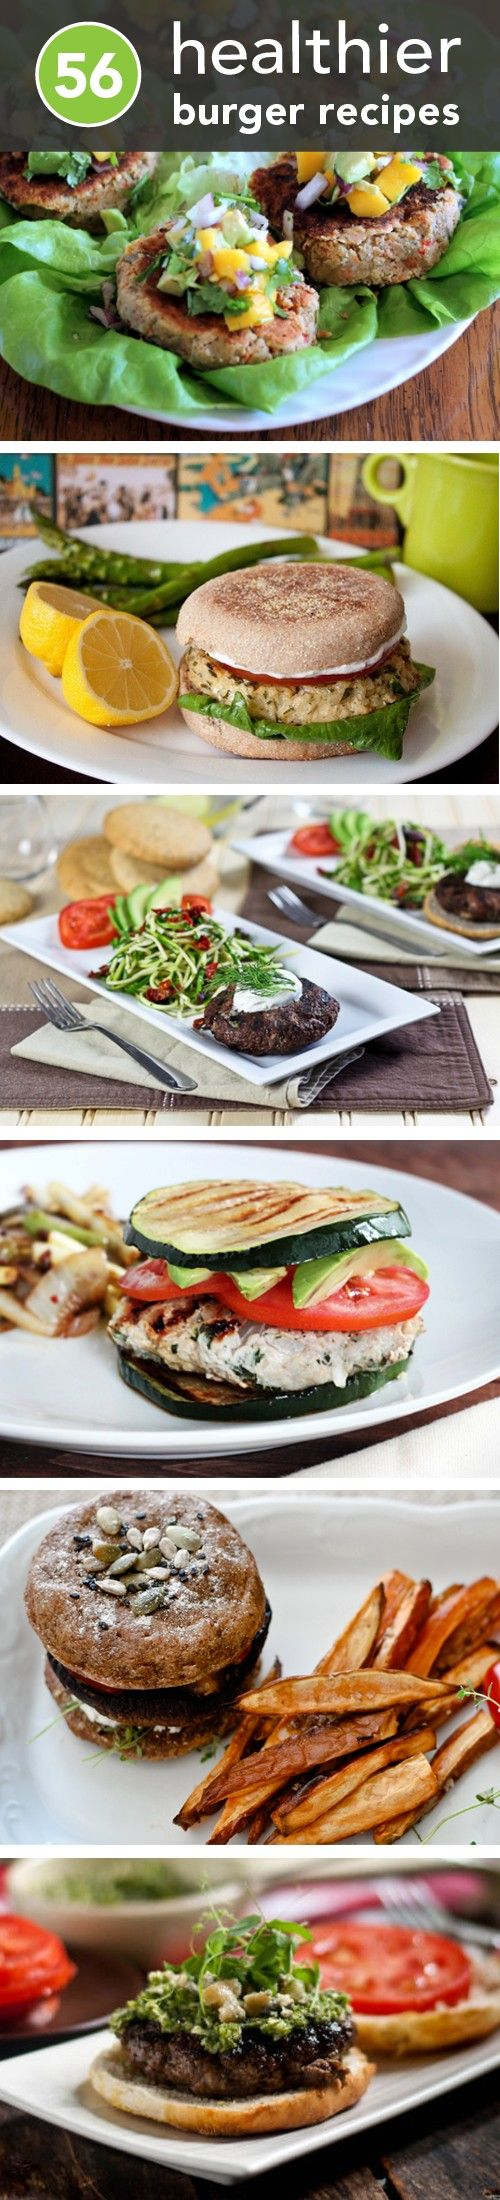 56 Healthier Burger Recipes